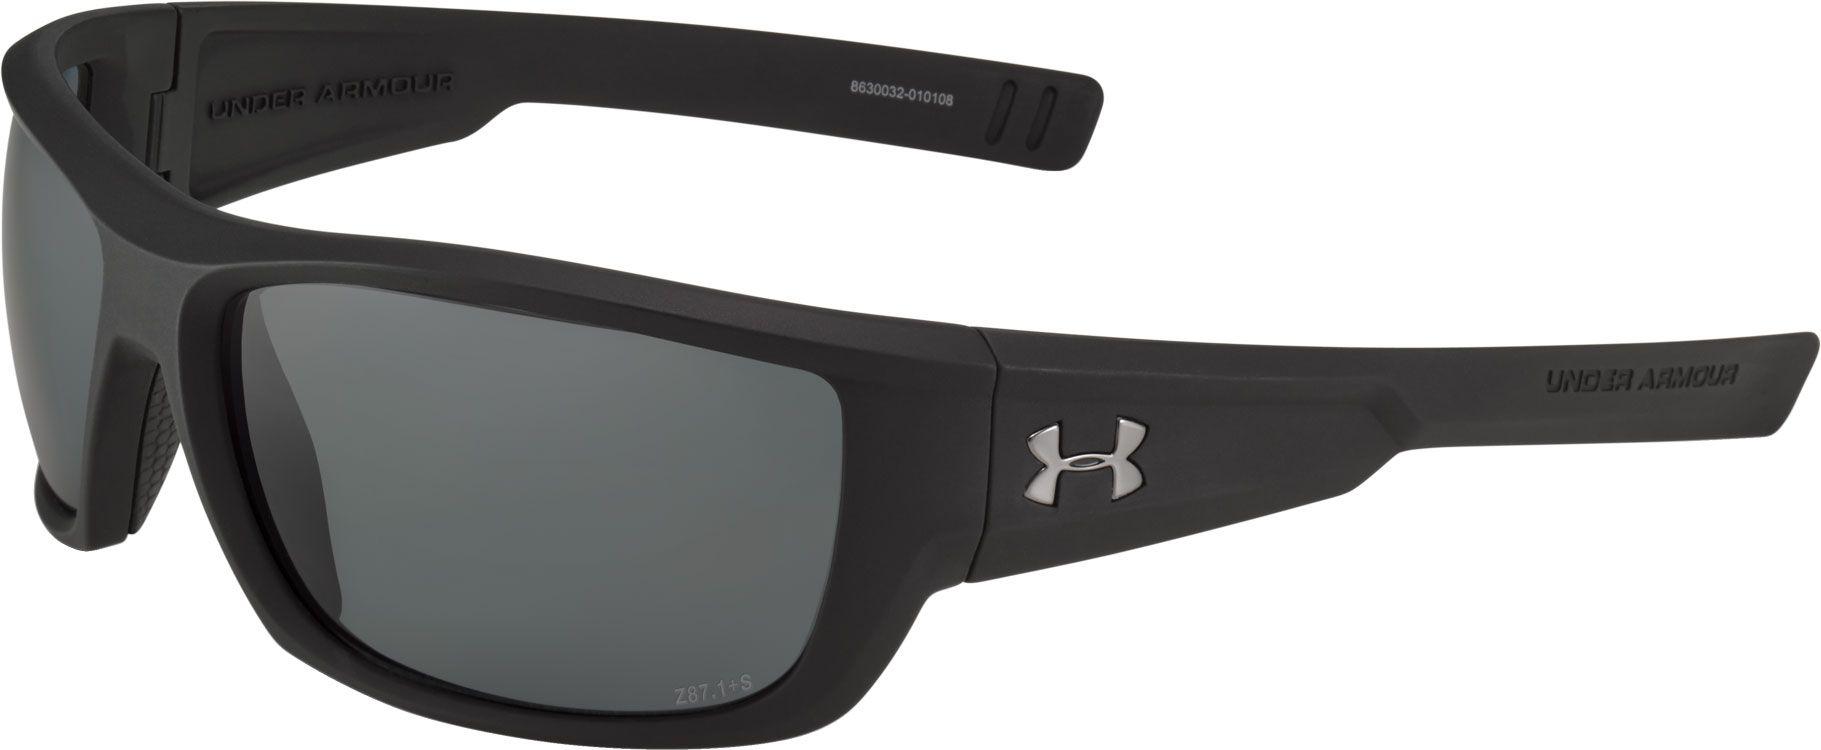 0264fb9dba Under Armour Men s Rumble Storm Polarized Sunglasses